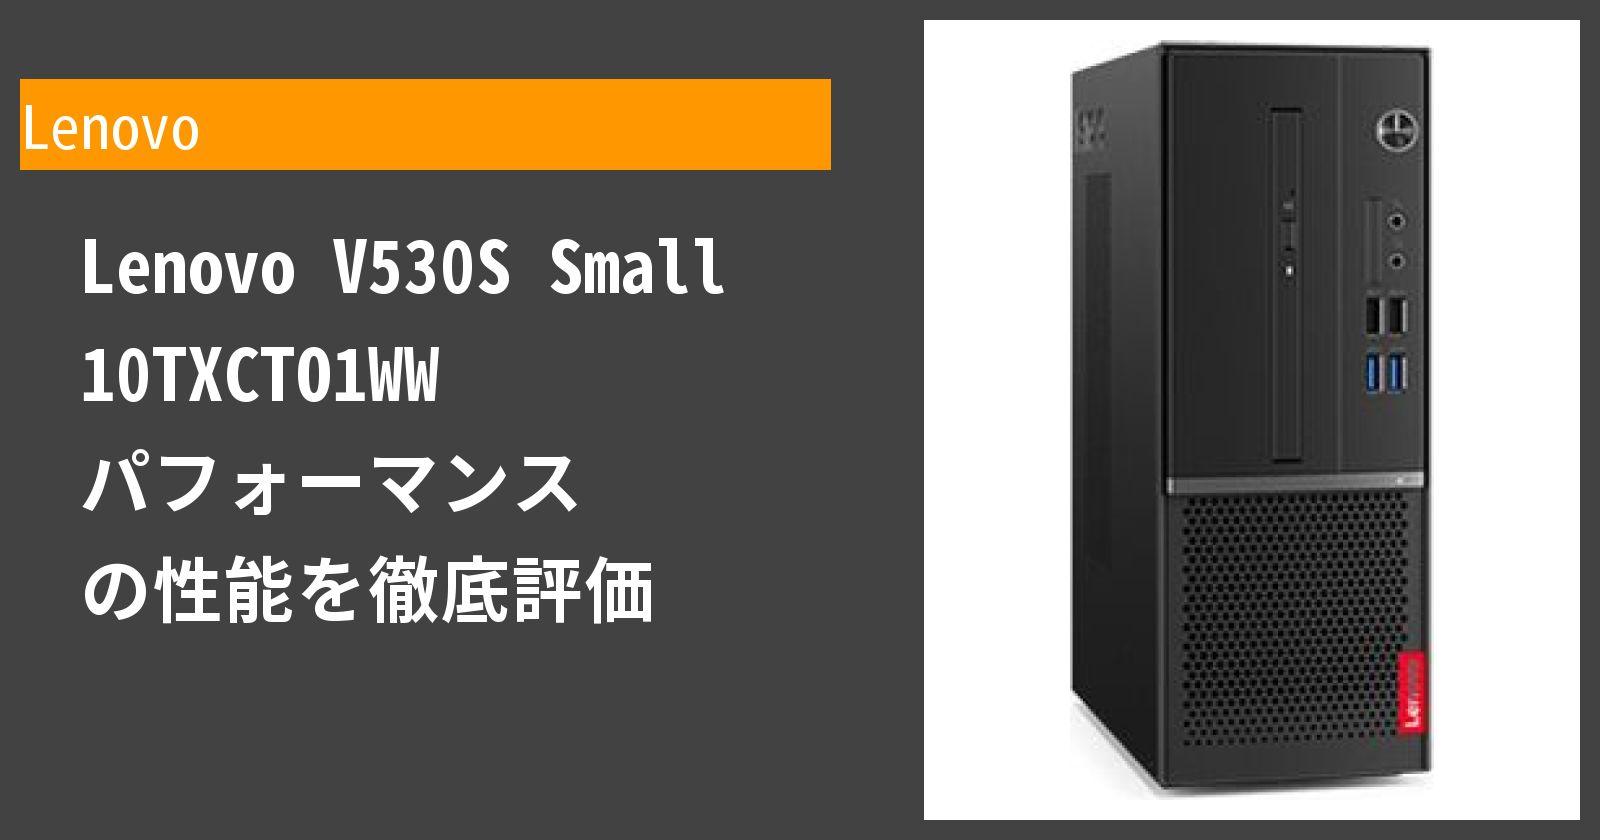 Lenovo V530S Small 10TXCTO1WW パフォーマンス の性能を徹底評価